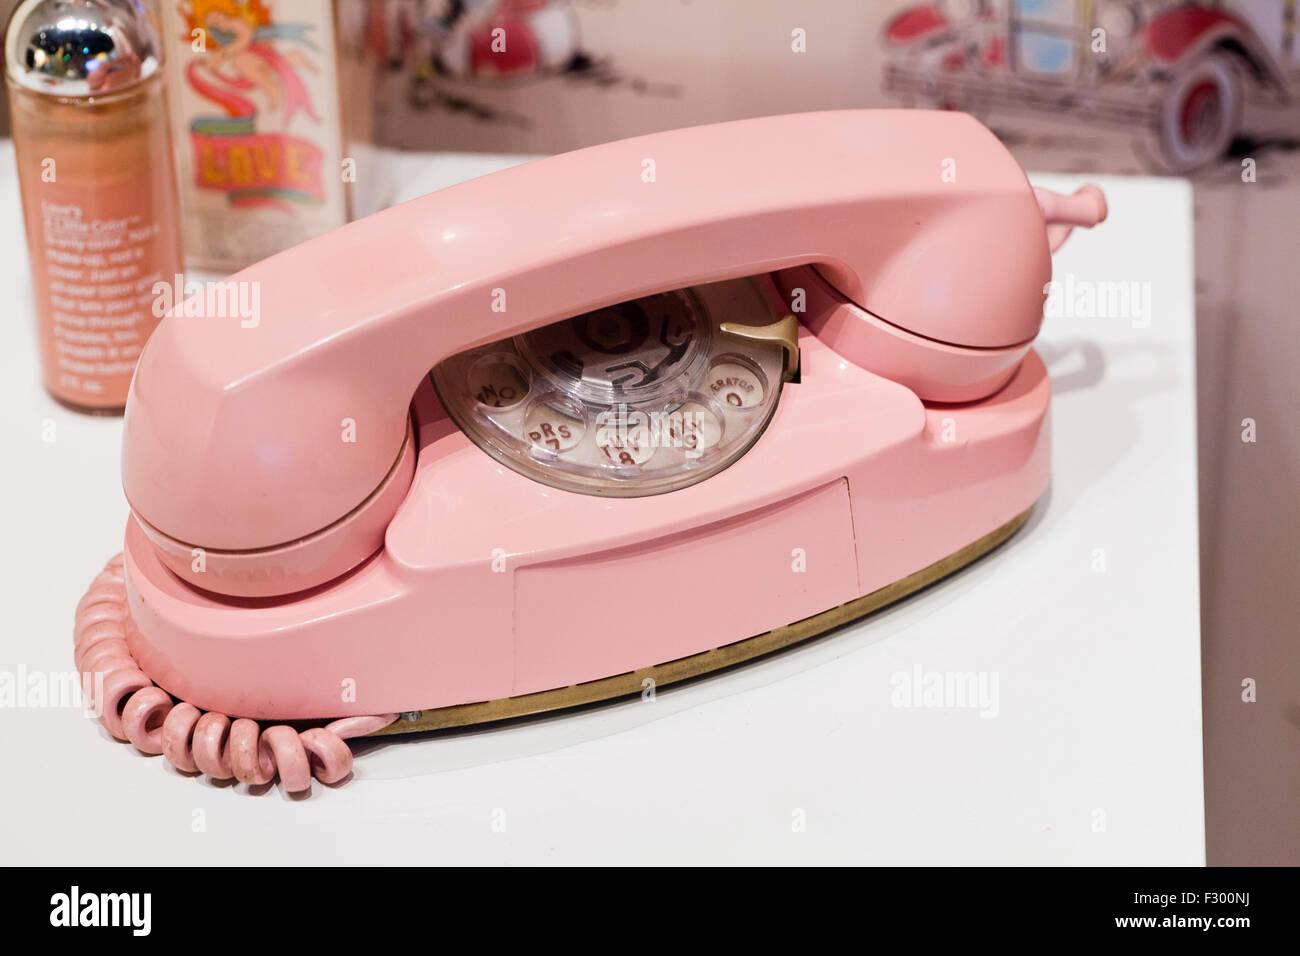 Princess phone, circa 1960s - USA - Stock Image